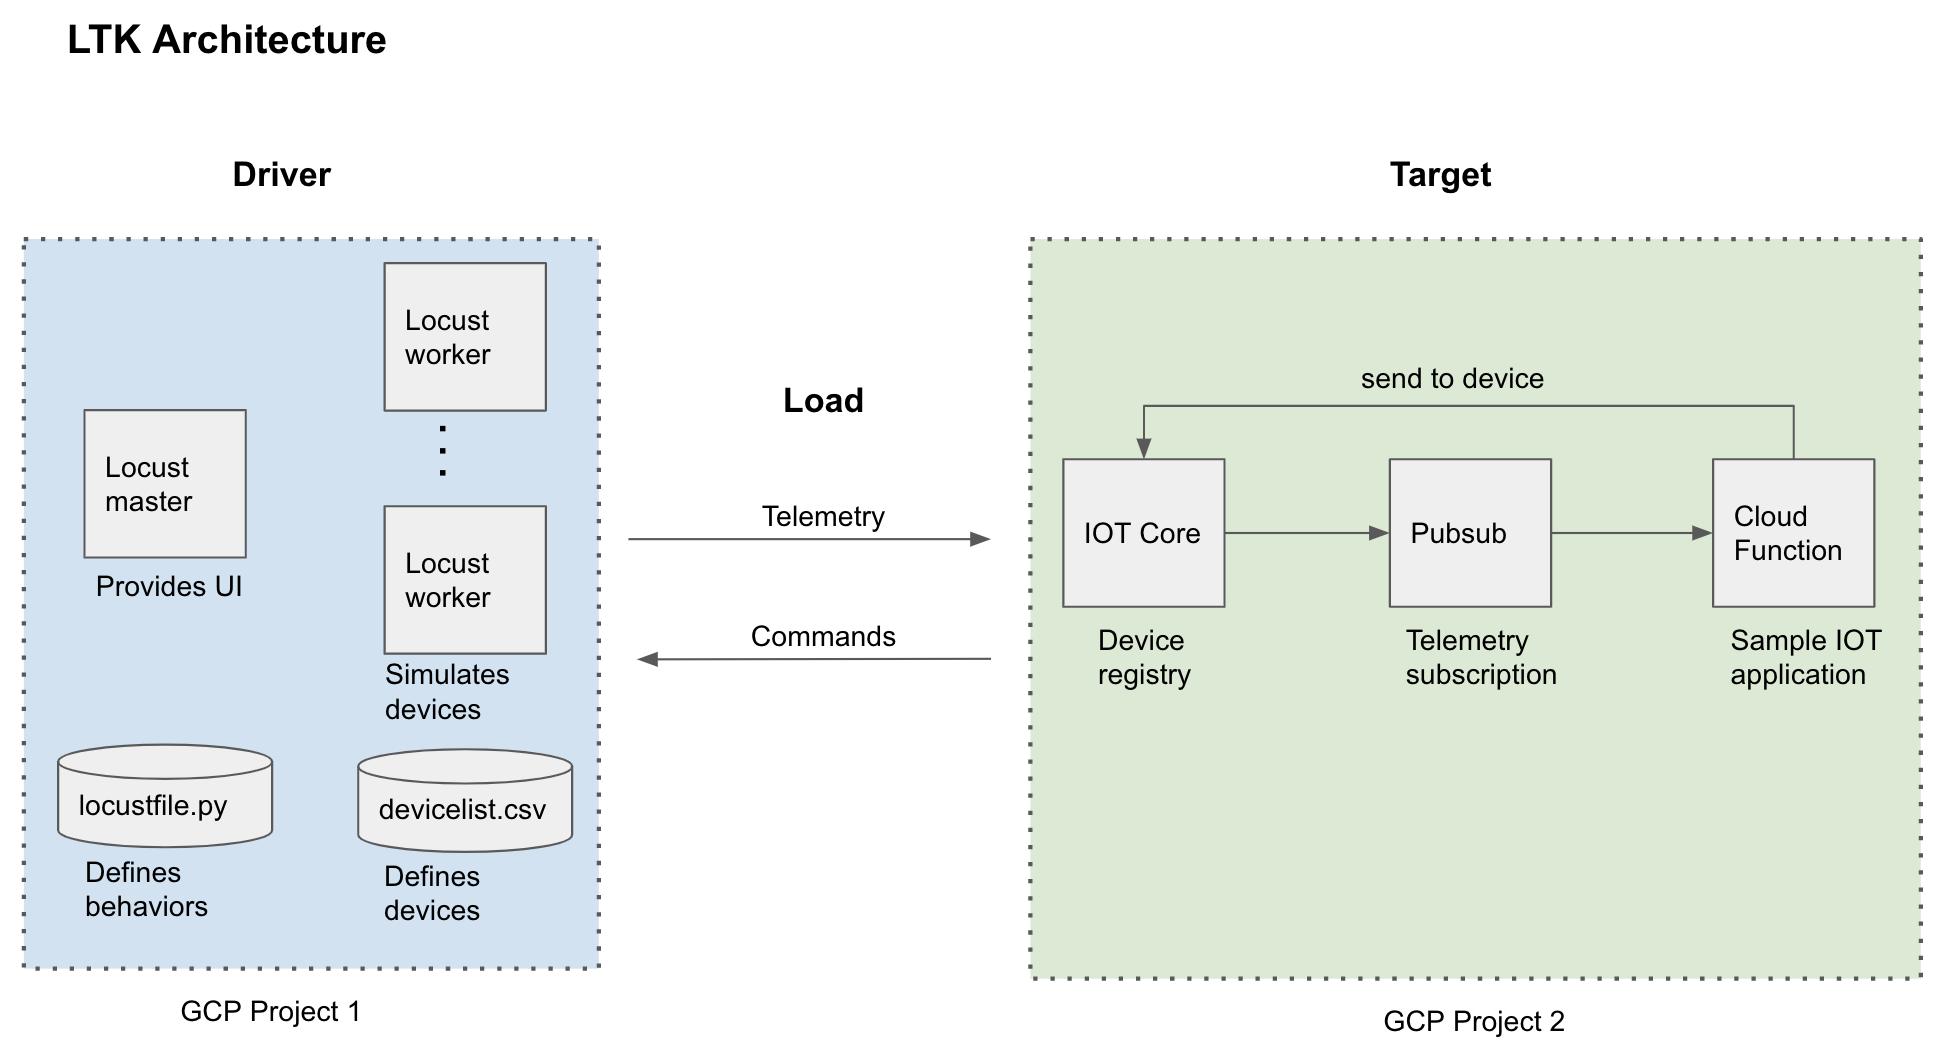 LTK architecture diagram